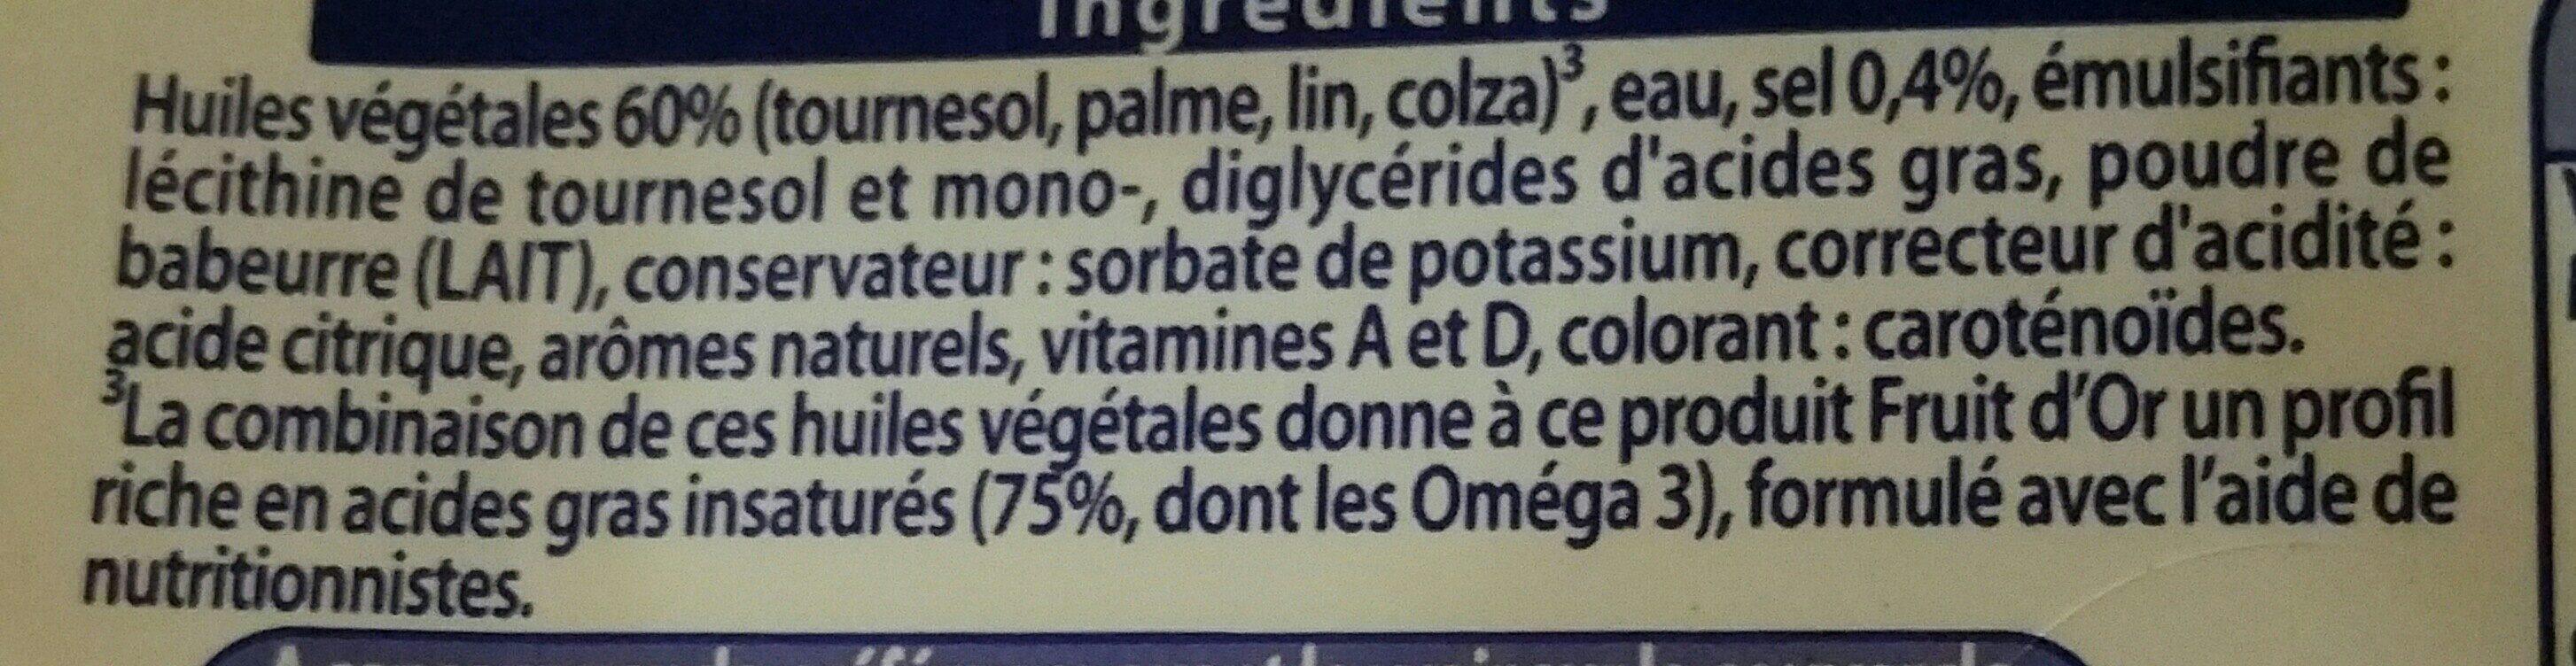 Fruit d'Or doux Tartine & Cuisson Oméga 3 - Ingrediënten - fr